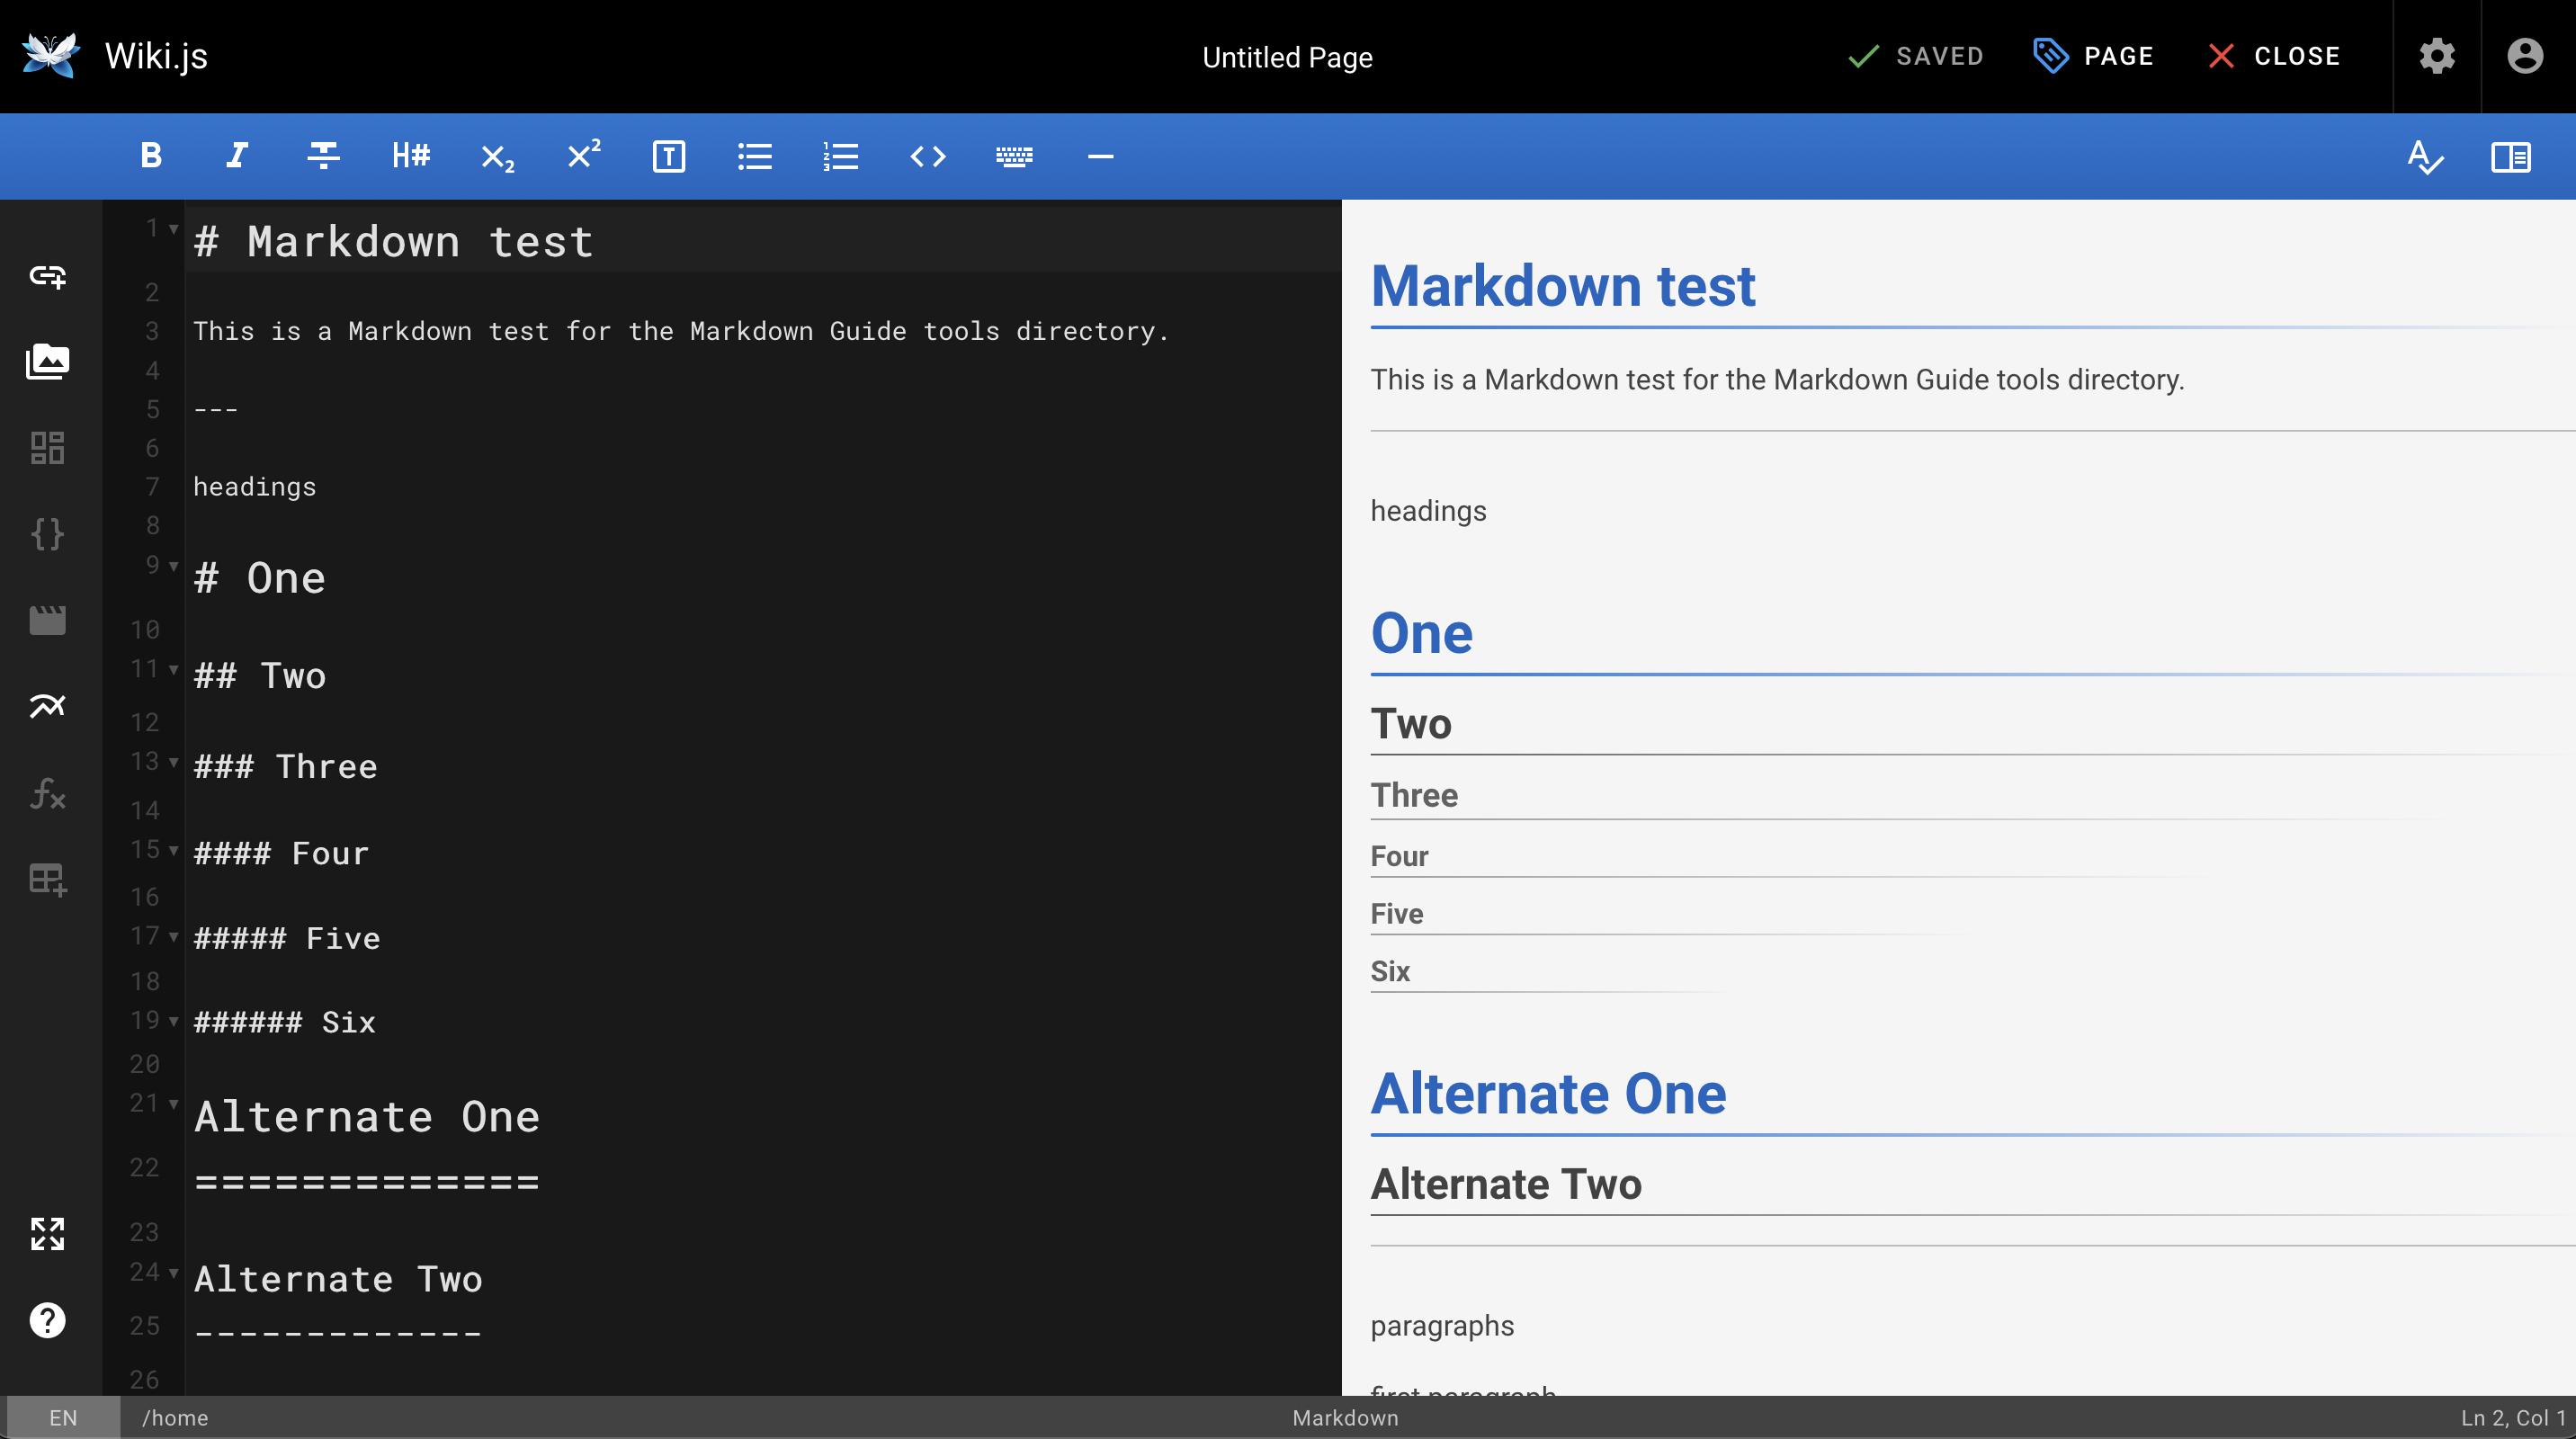 Wiki.js Markdown application